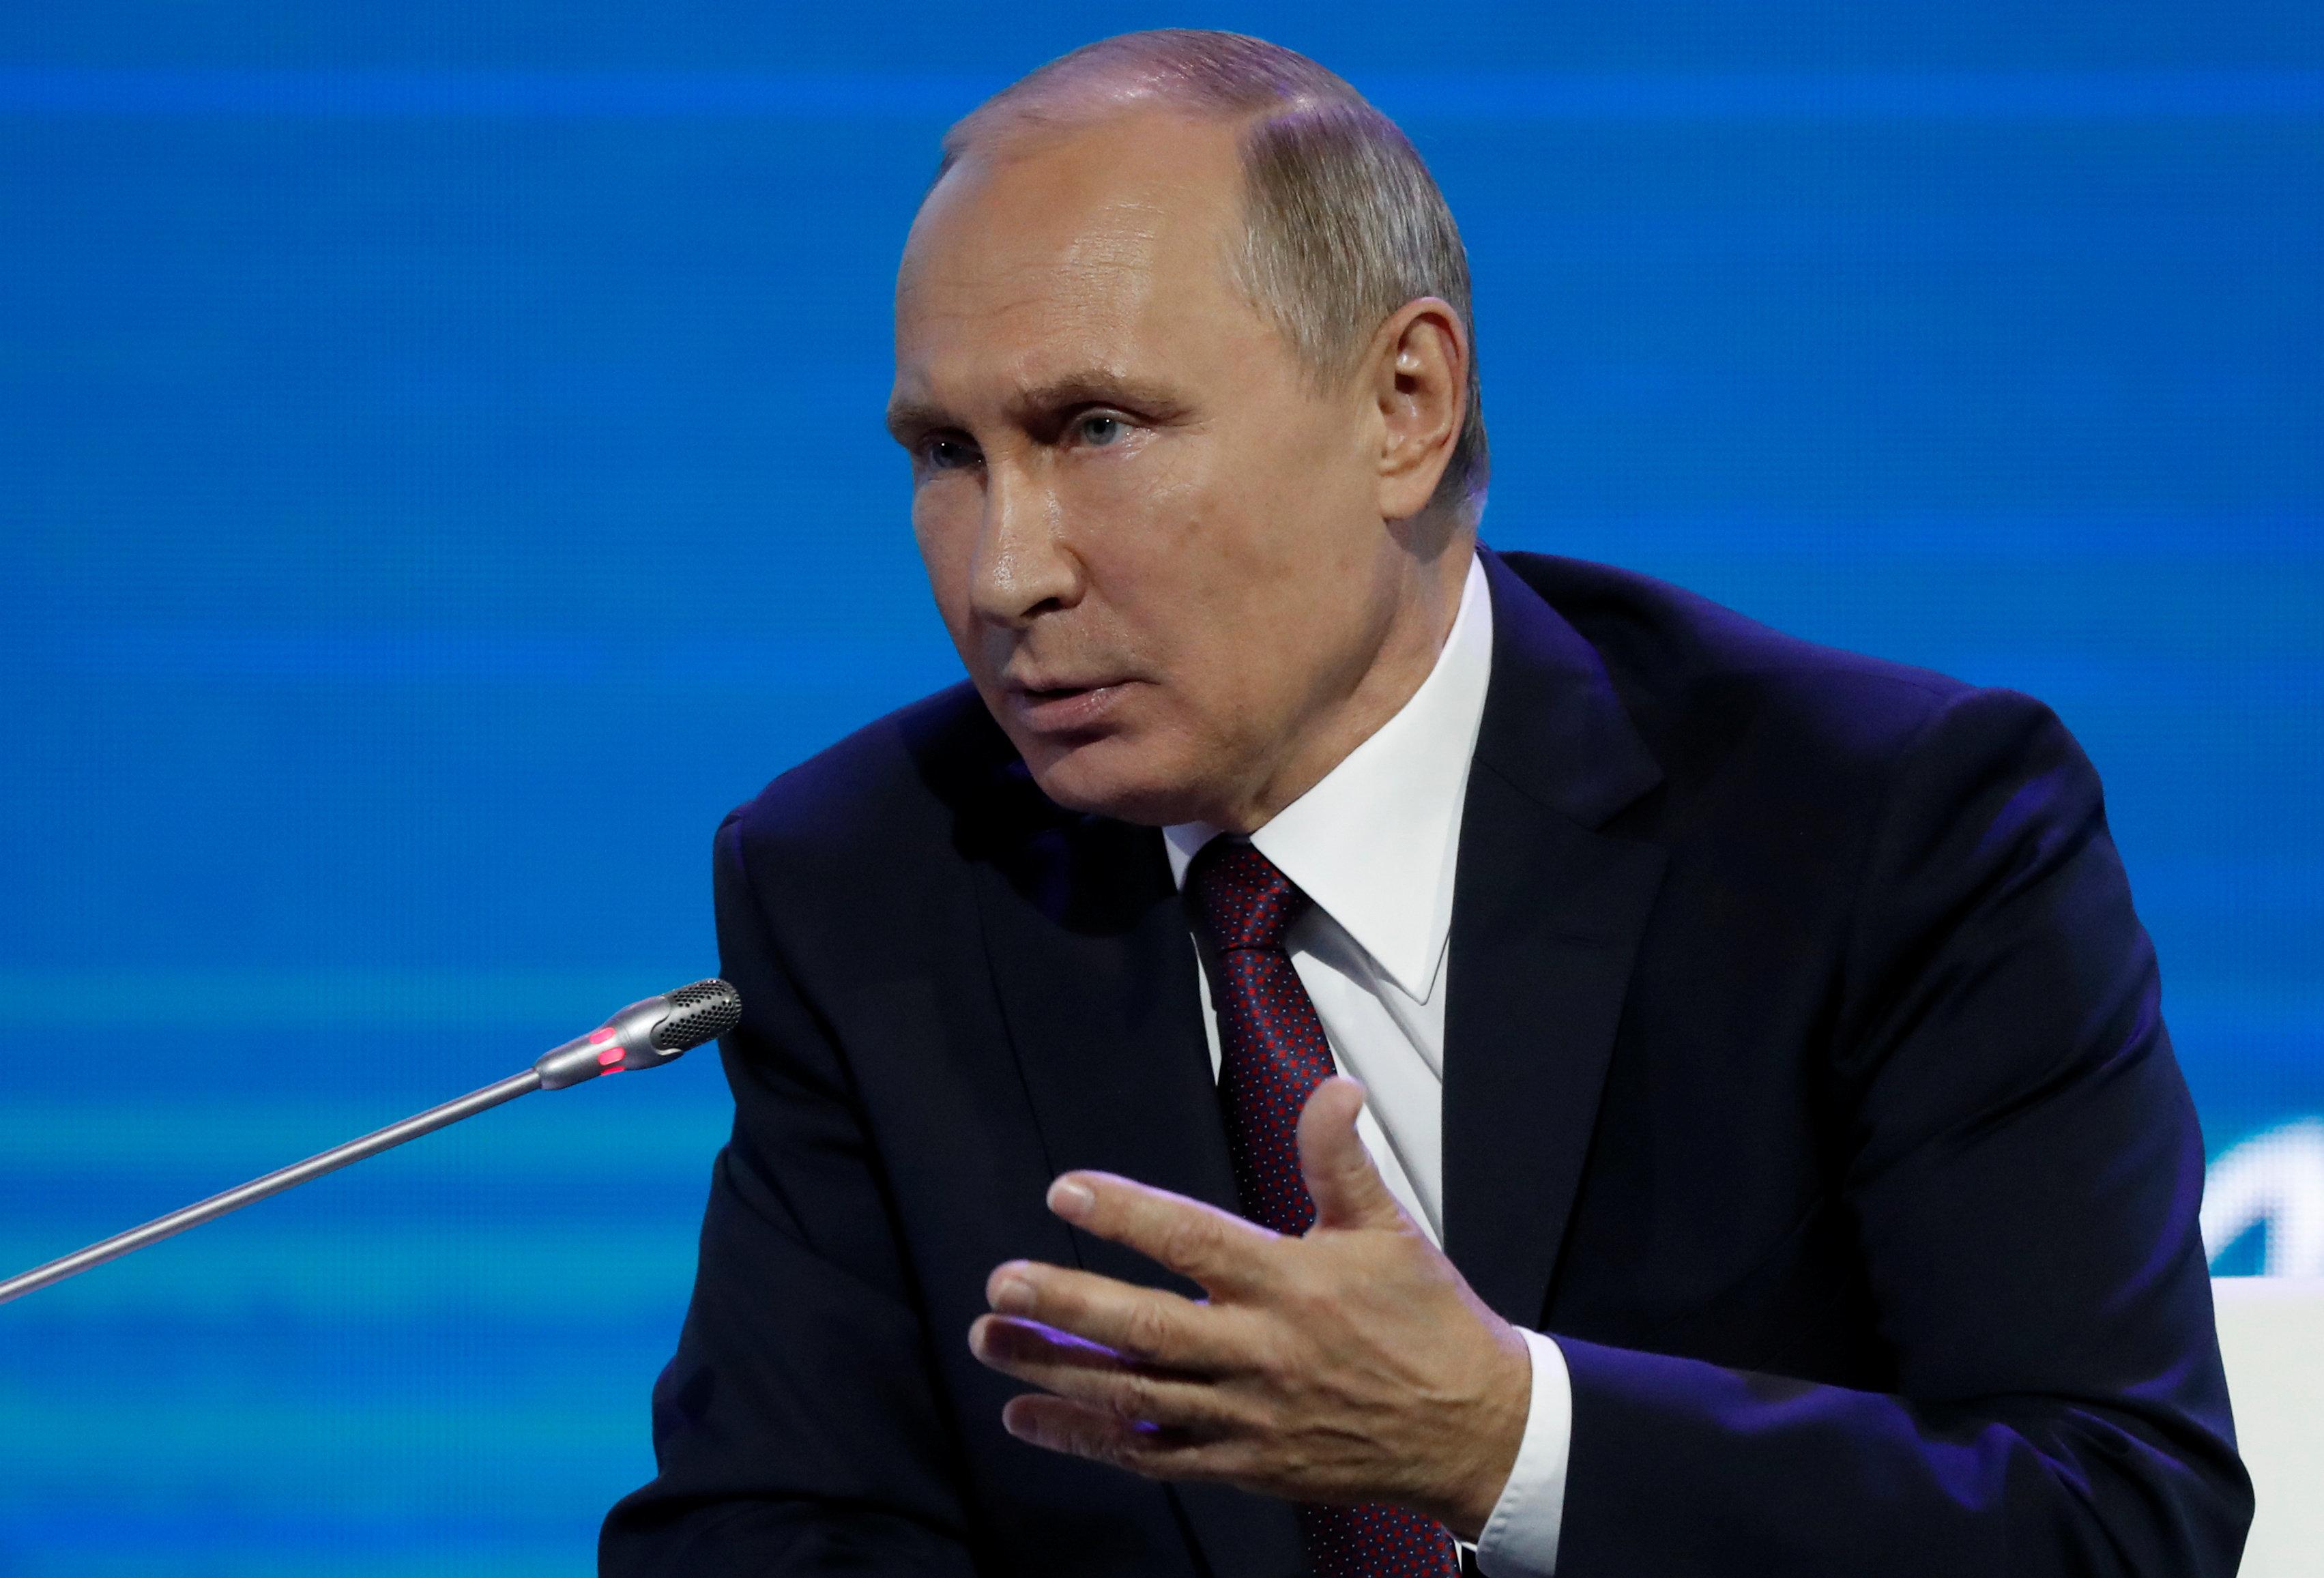 Russian President Vladimir Putin speaks during a session of the Eastern Economic Forum in Vladivostok, Russia September 7, 2017. REUTERS/Sergei Karpukhin